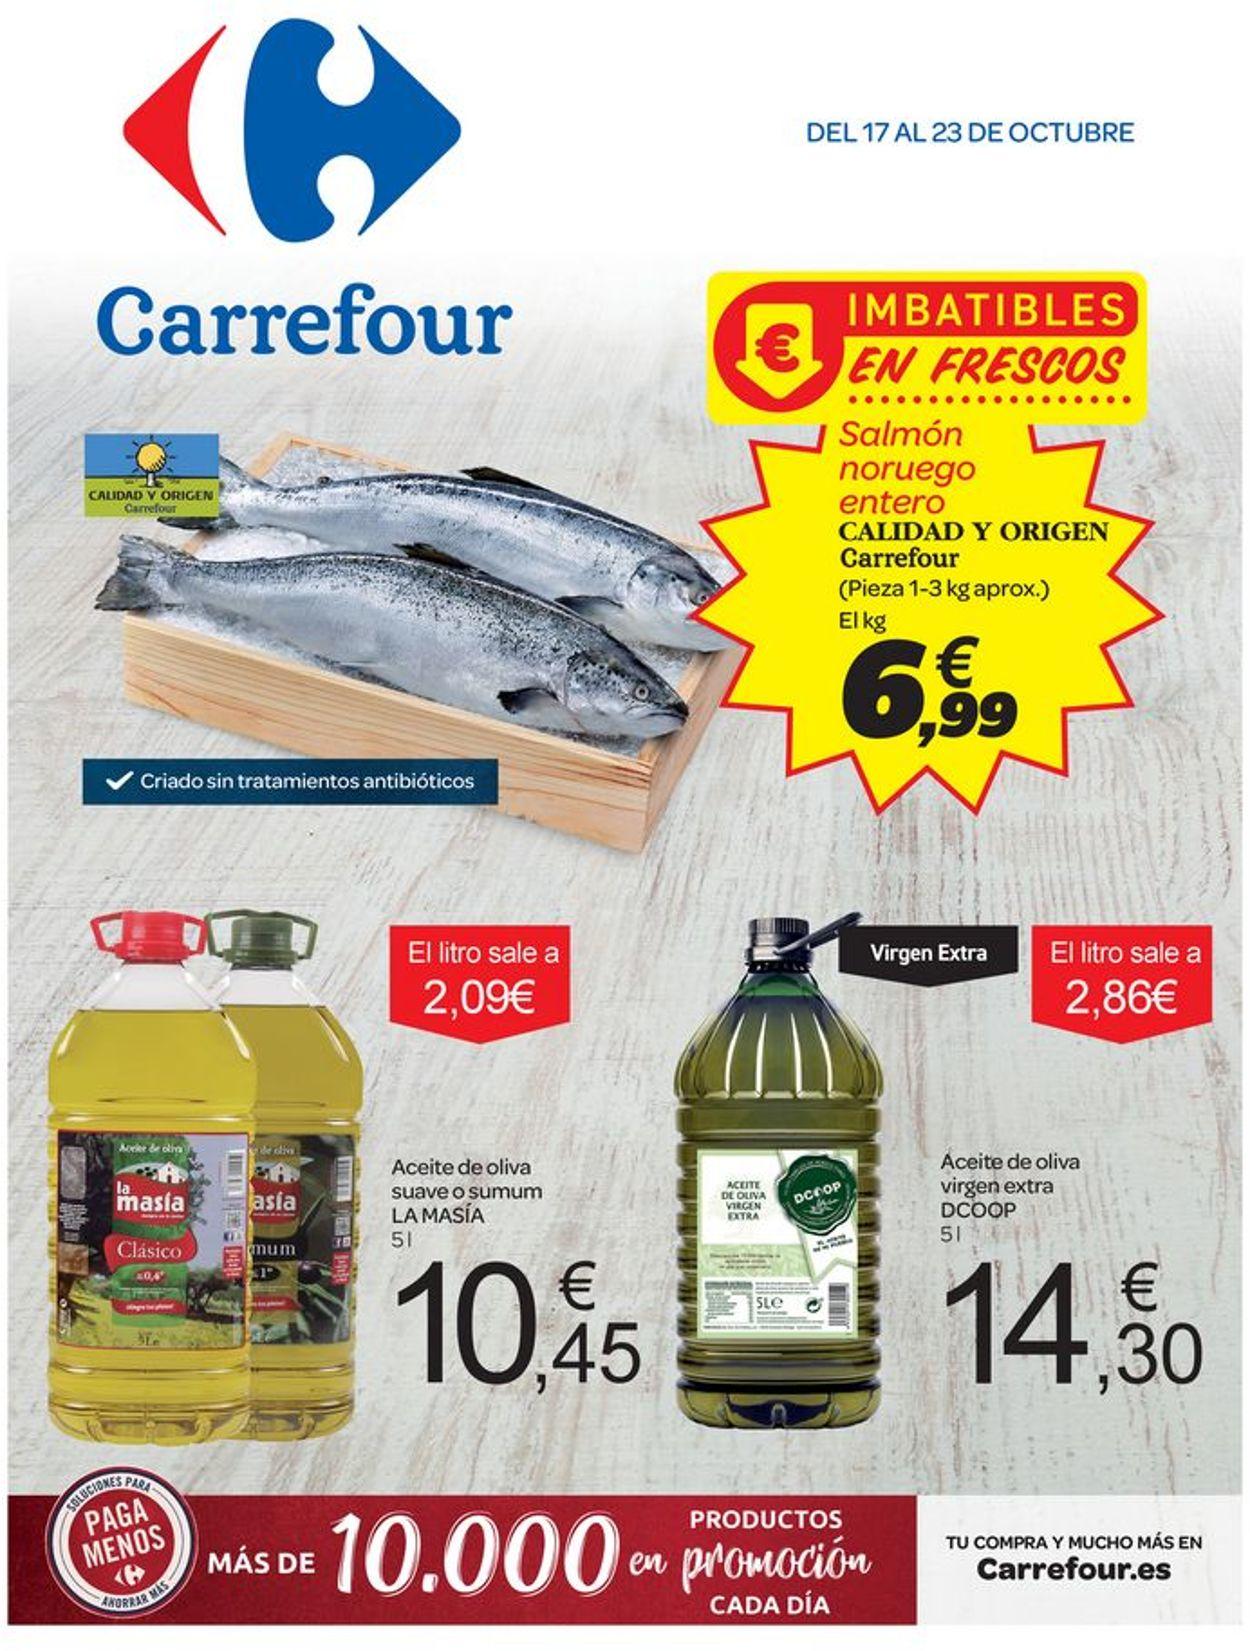 Carrefour Folleto - 17.10-23.10.2019